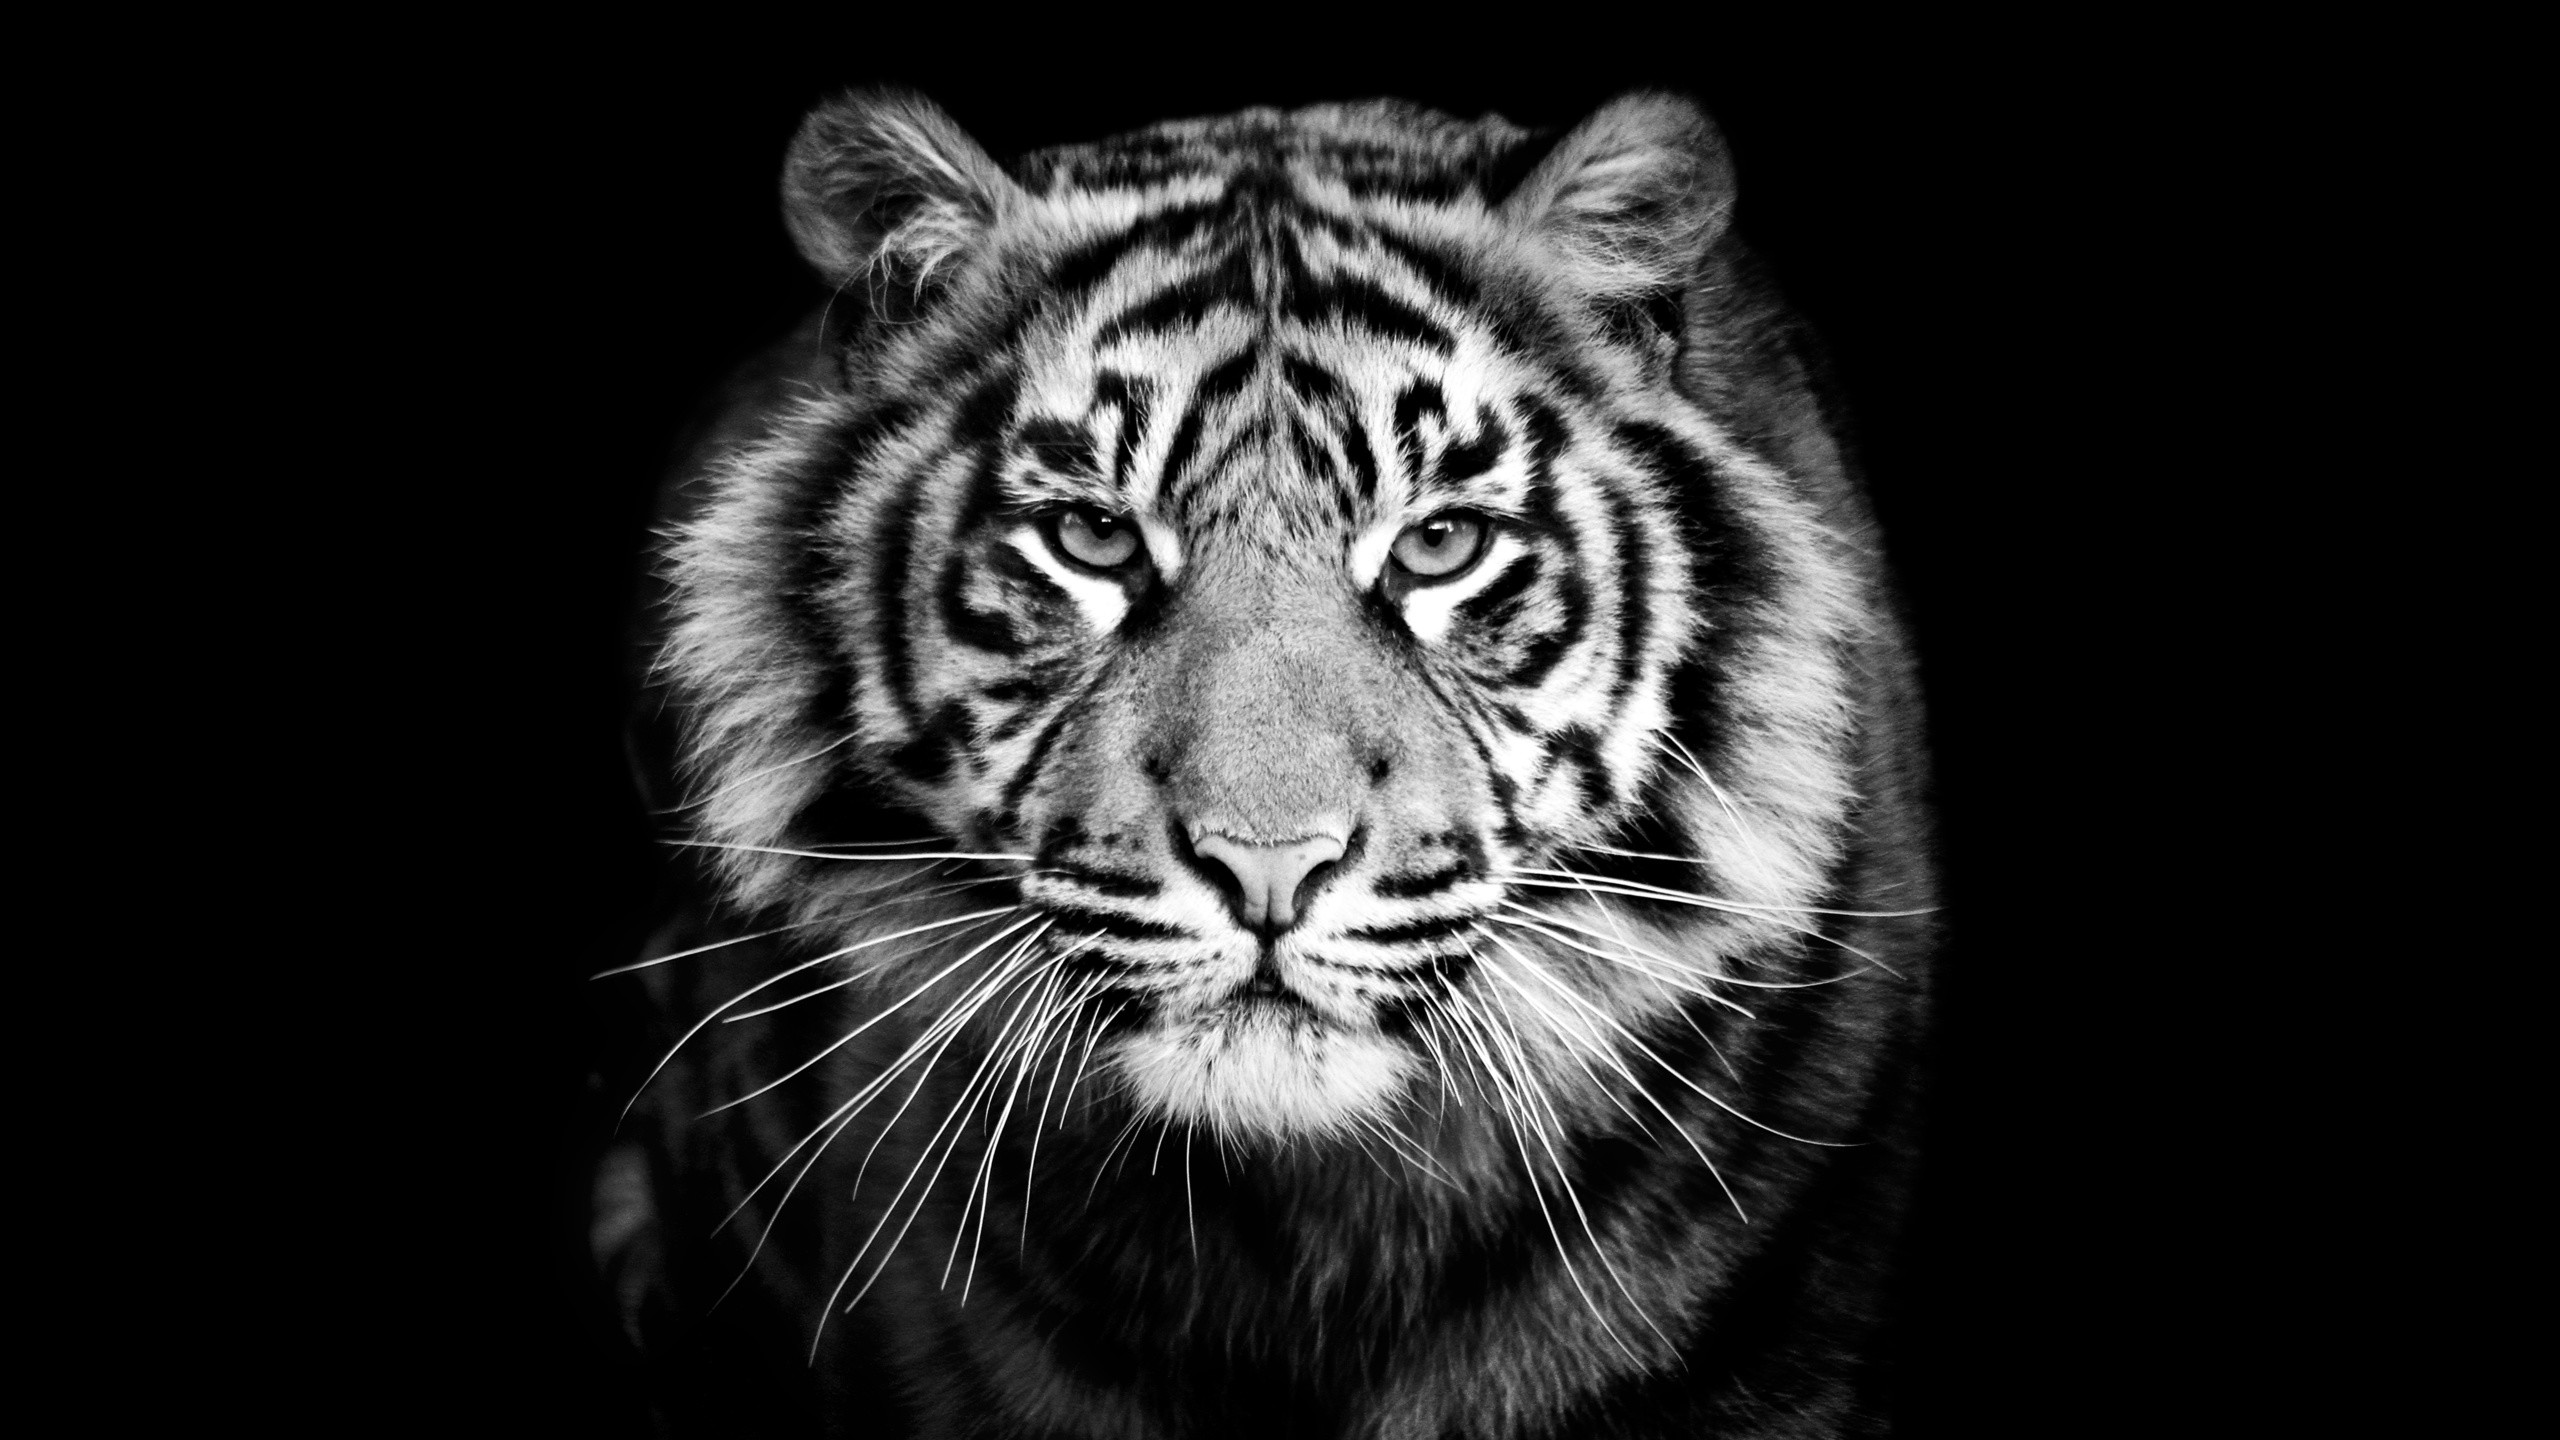 Animals, Tiger, Predator, Black And White Backgroun, Whiskers, Black  Background, Animals …